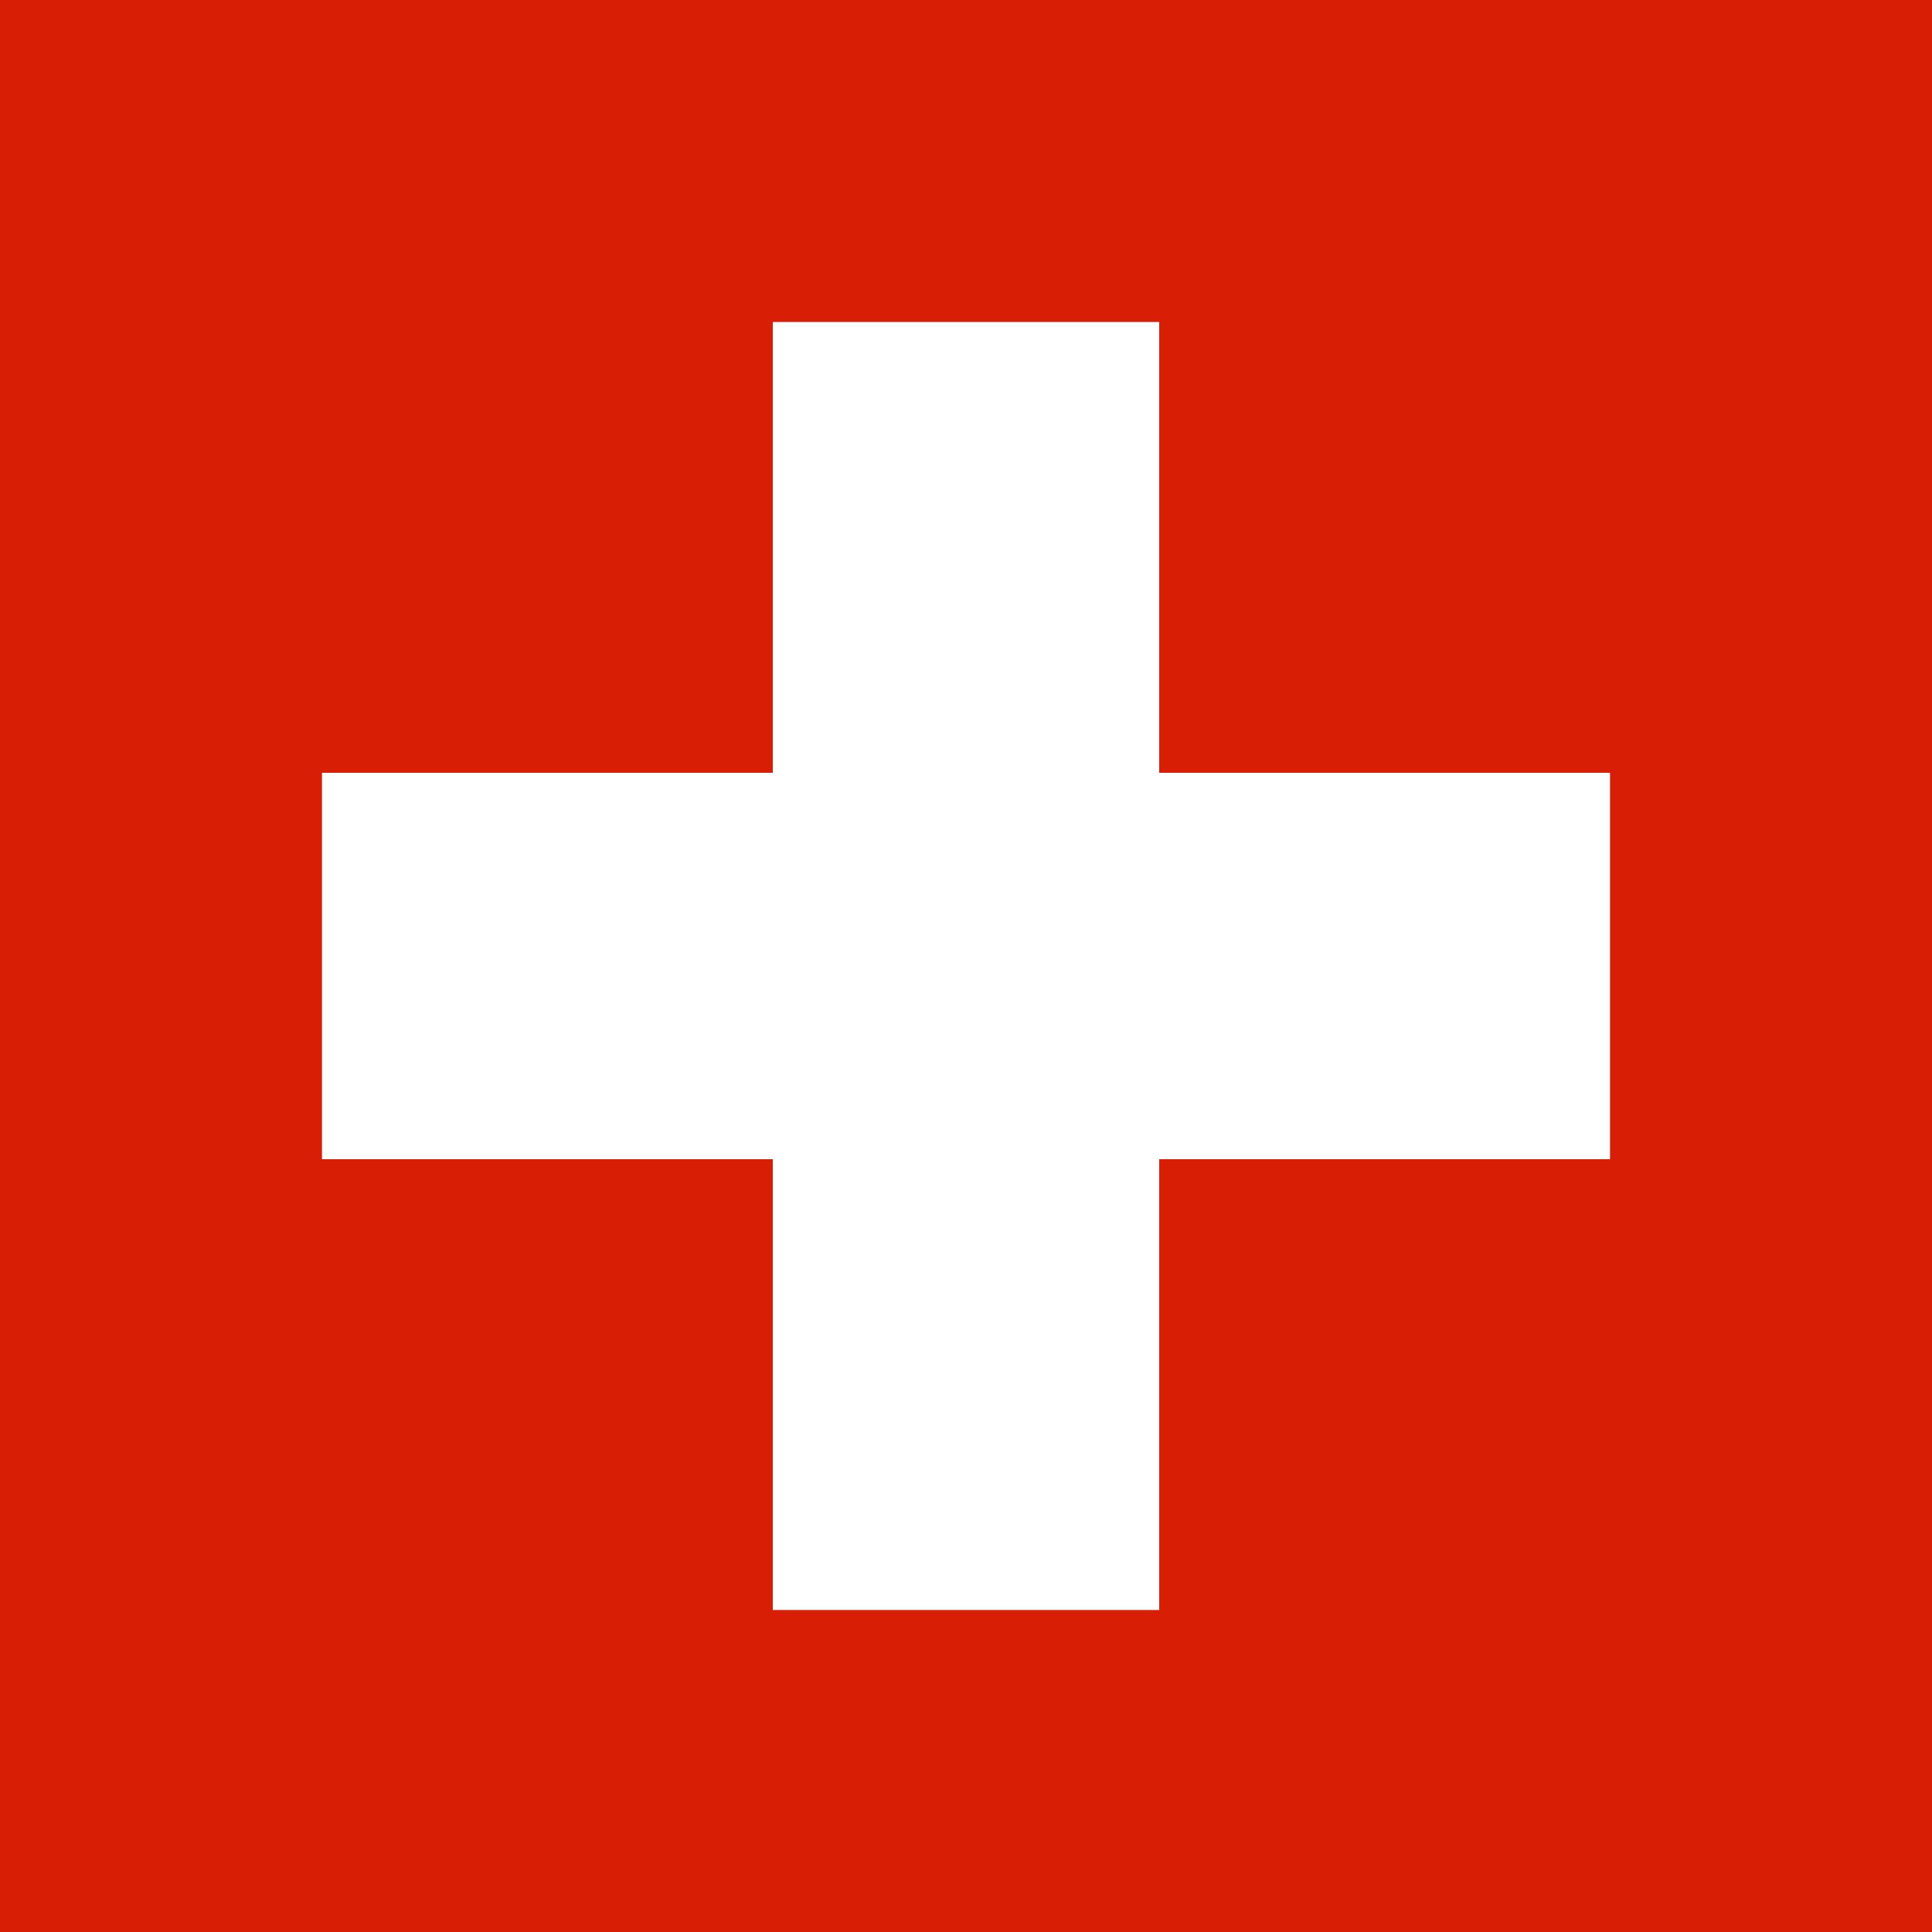 स्विट्ज़रलैंड, देश, emblema, लोग�प्रतीकbolo - HD वॉलपेपर - प्रोफेसर-falken.com